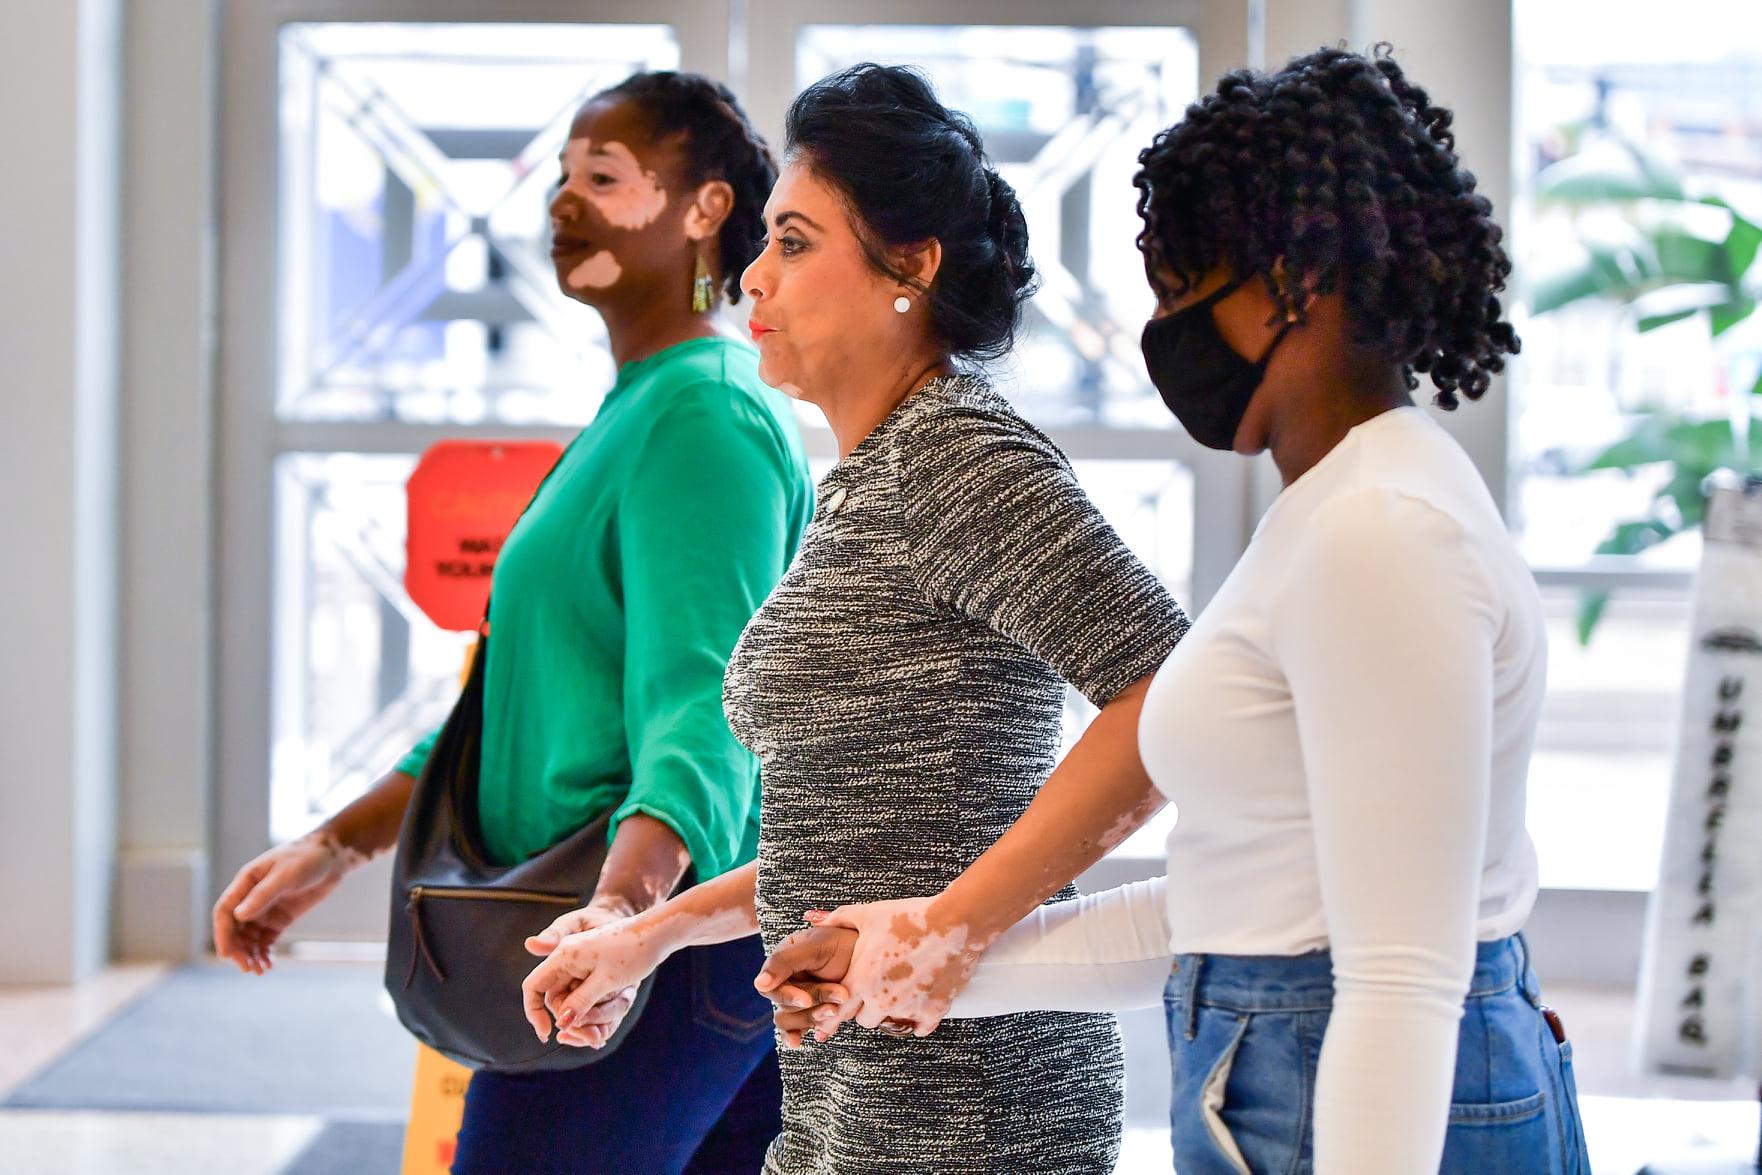 Florida State Representative Daisy Morales (center) hosts her 2021 World Vitiligo Day Celebration at Orlando City Hall, Friday, June 25, 2021. (Photo by Harry Castiblanco/Florida National News)